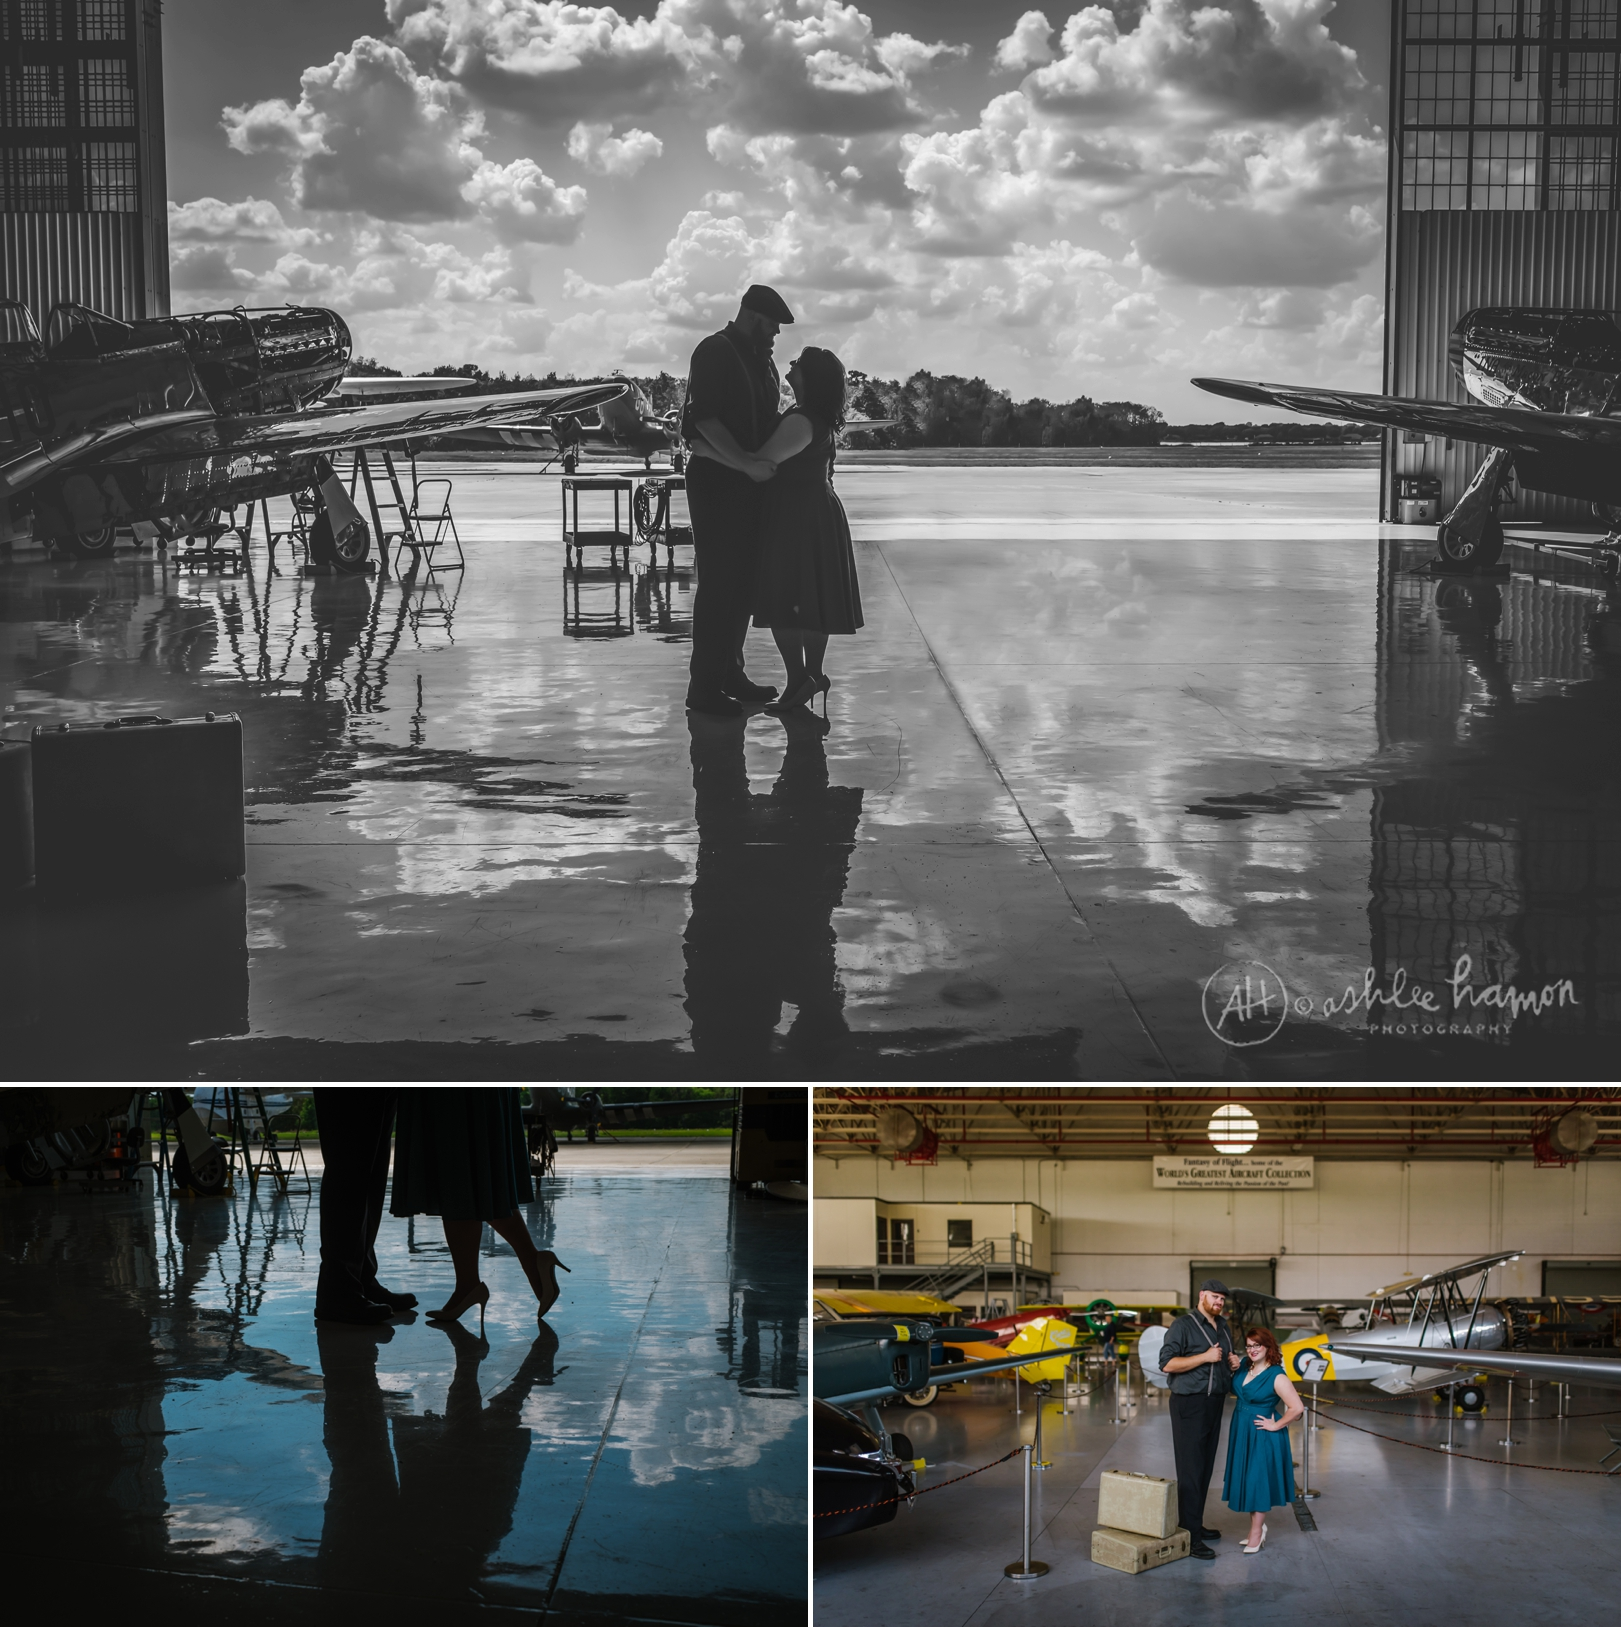 fantasy-of-flight-aviation-themed-engagement-photos-lakeland-florida_0004.jpg